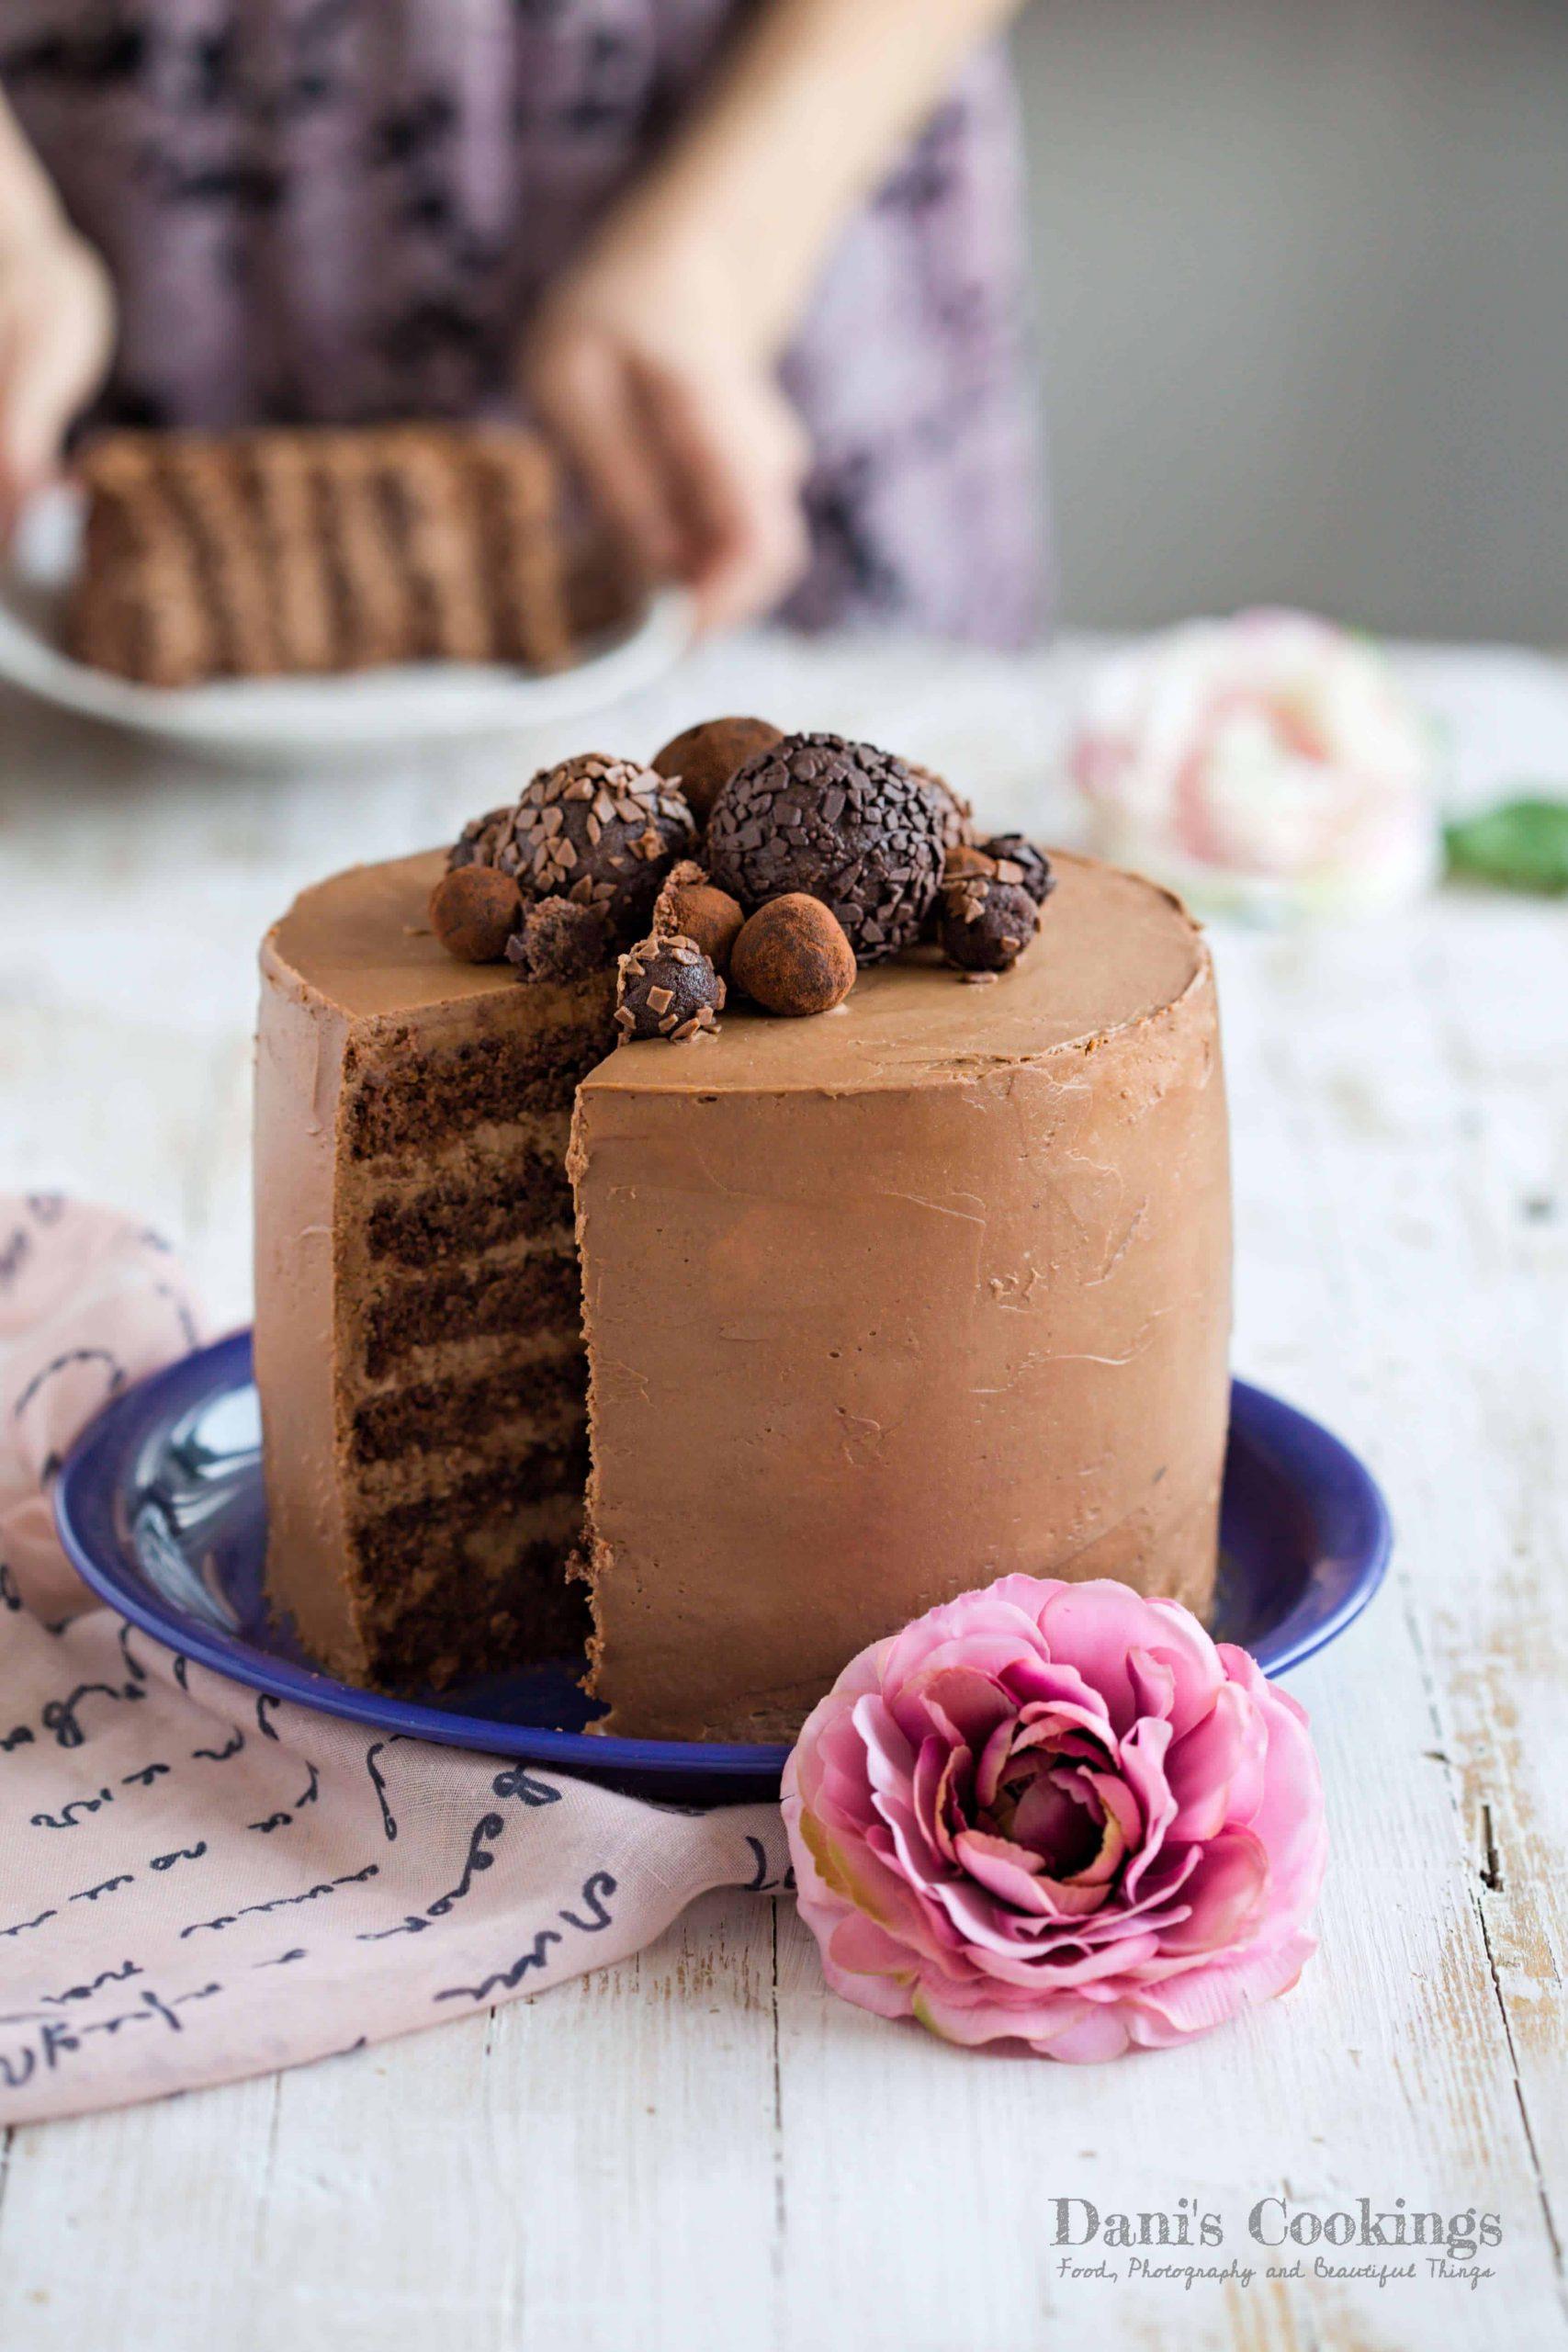 Dreamy Chocolate Layer Cake with Chocolate Truffles | Dani's Cookings